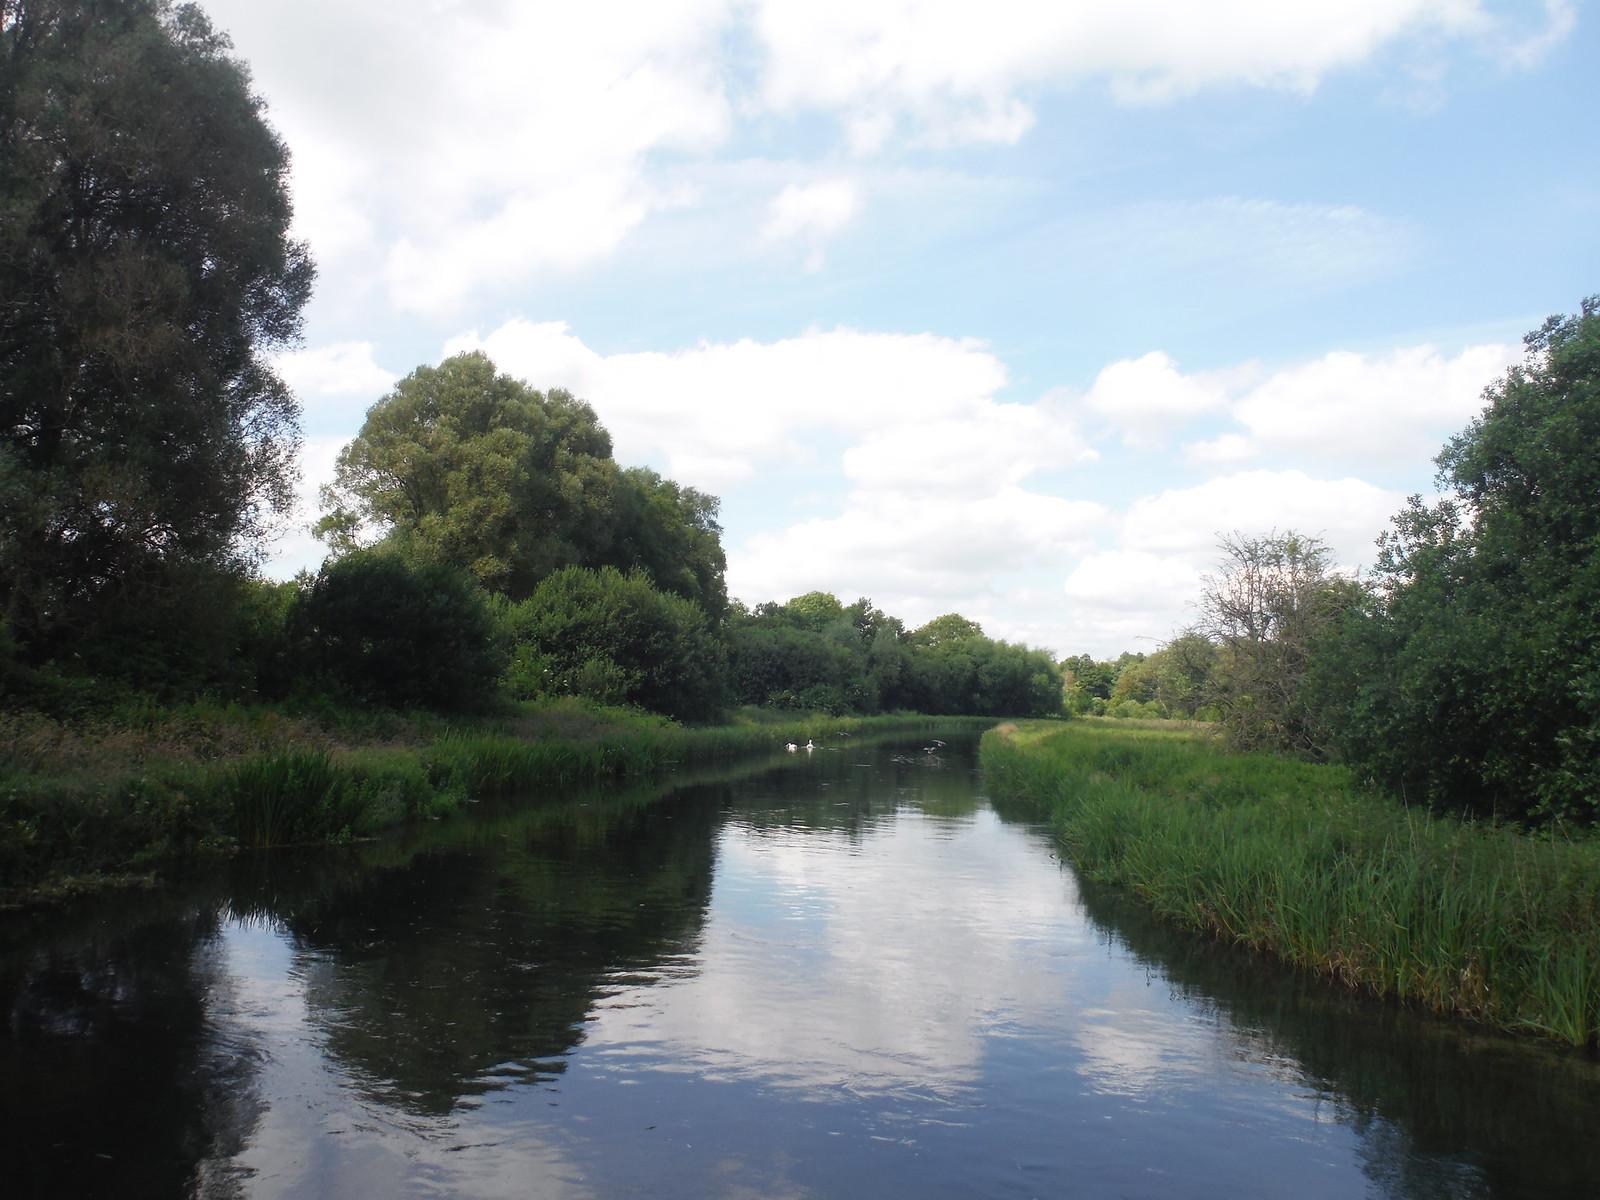 Park Stream, Test Meadows SWC Walk 265 - Dean to Mottisfont and Dunbridge